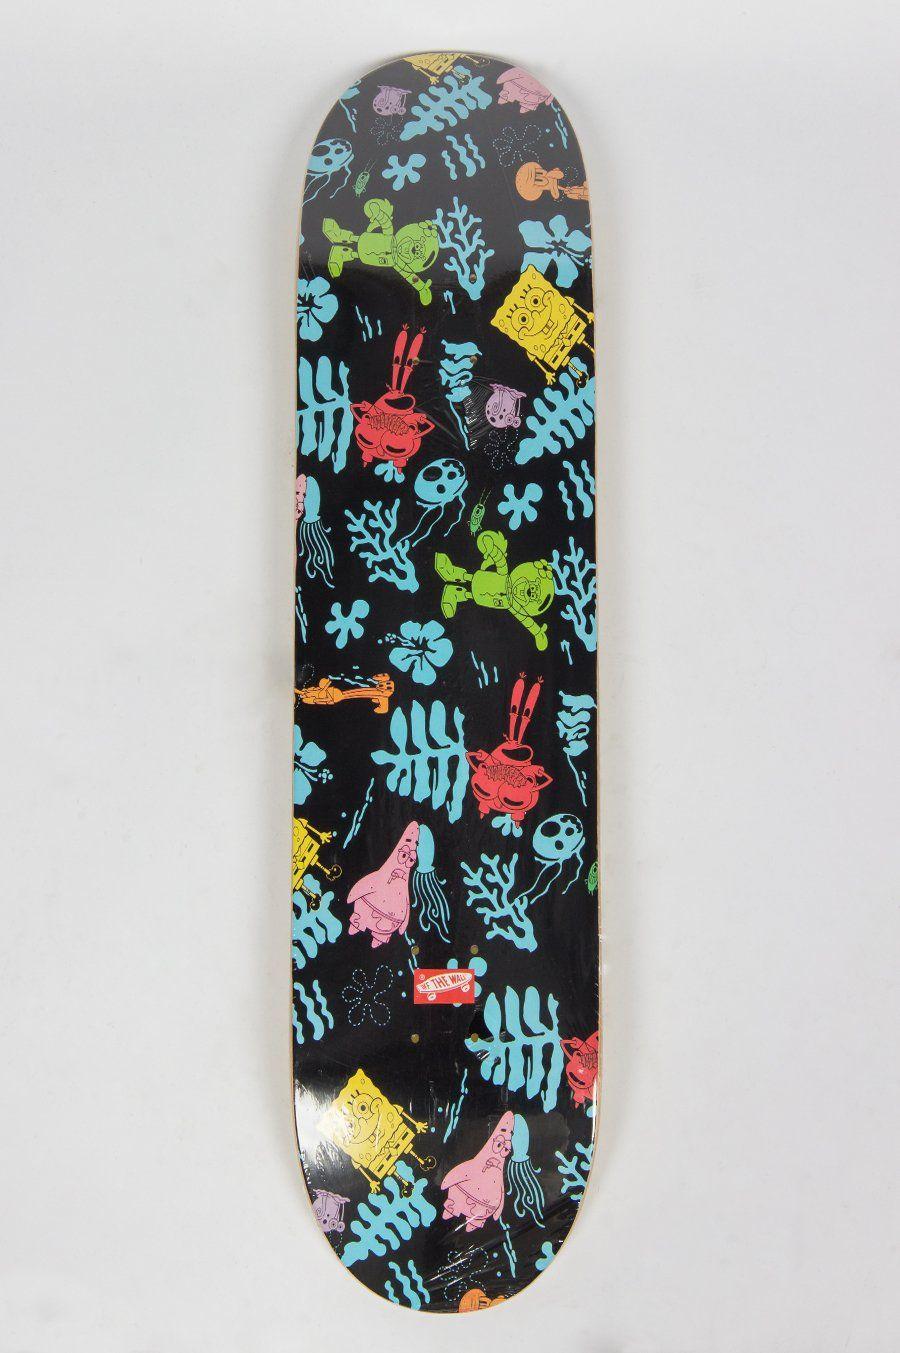 Nickelodeon Skateboard : nickelodeon, skateboard, VAULT, SPONGEBOB, SKATEBOARD, ALOHA, Skateboard, Decks,, Painted, Skateboard,, Spongebob